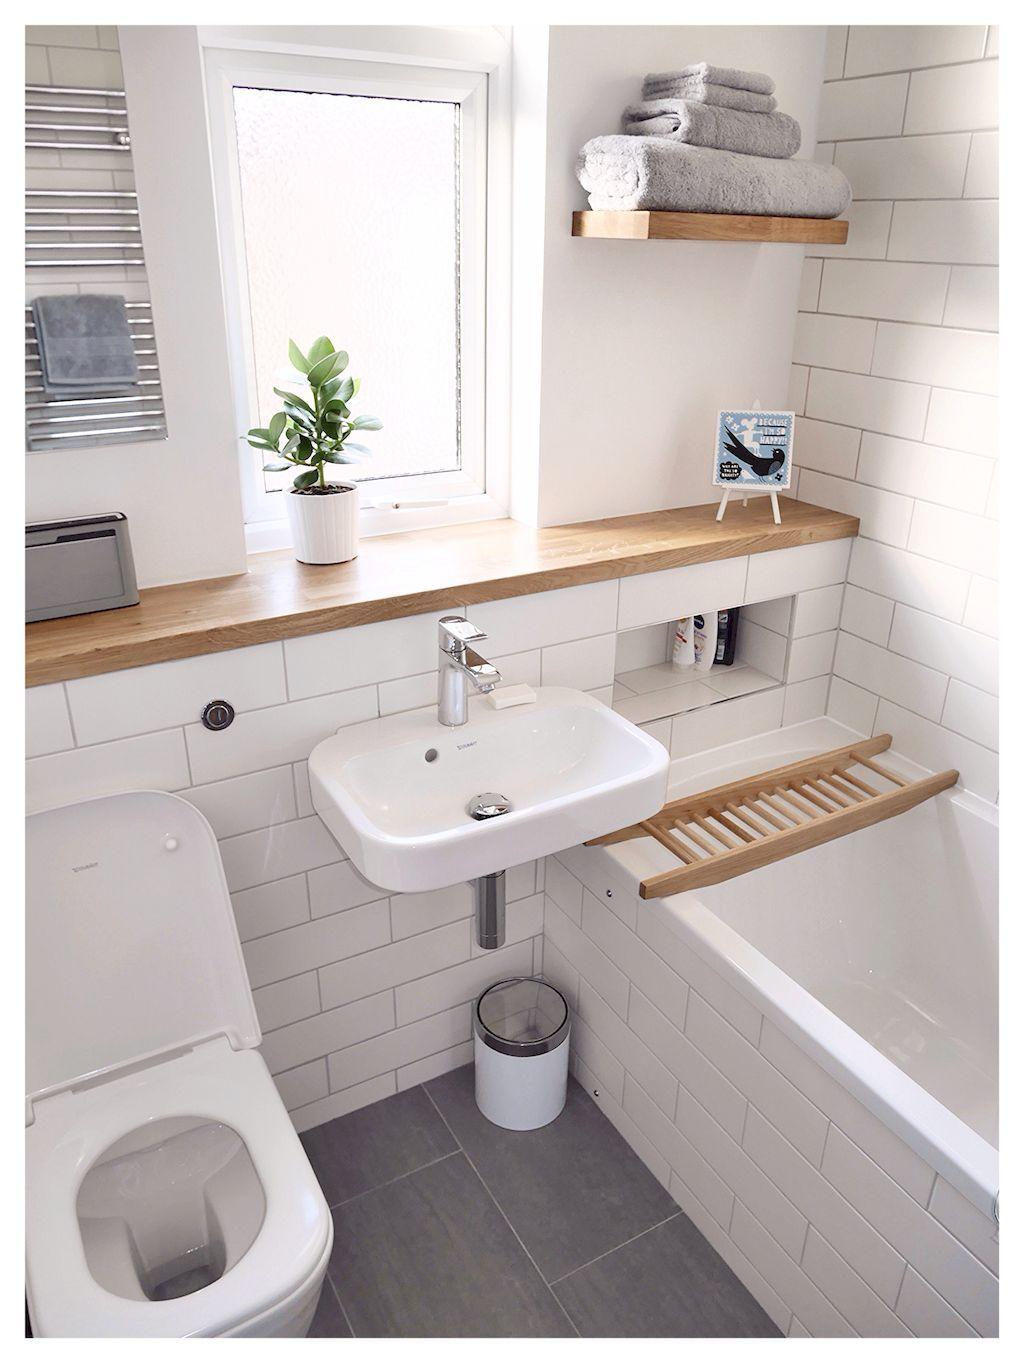 simple tiny space bathroom ideas on a budget tiny spaces